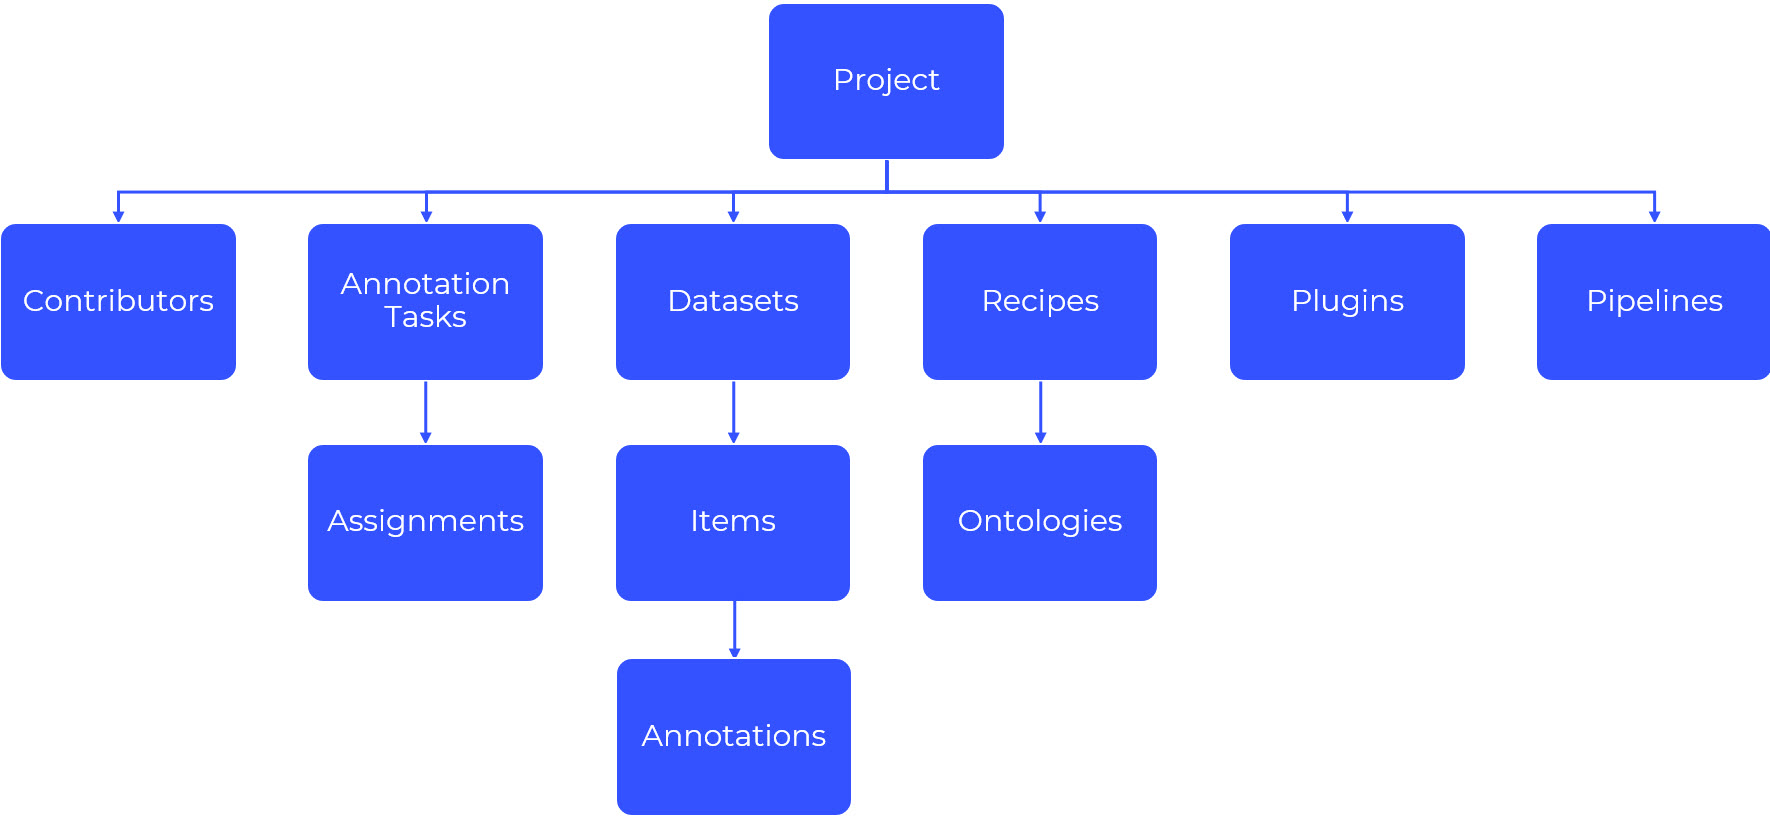 d31c377-Dataloopprojecthierarchyjpg.jpg